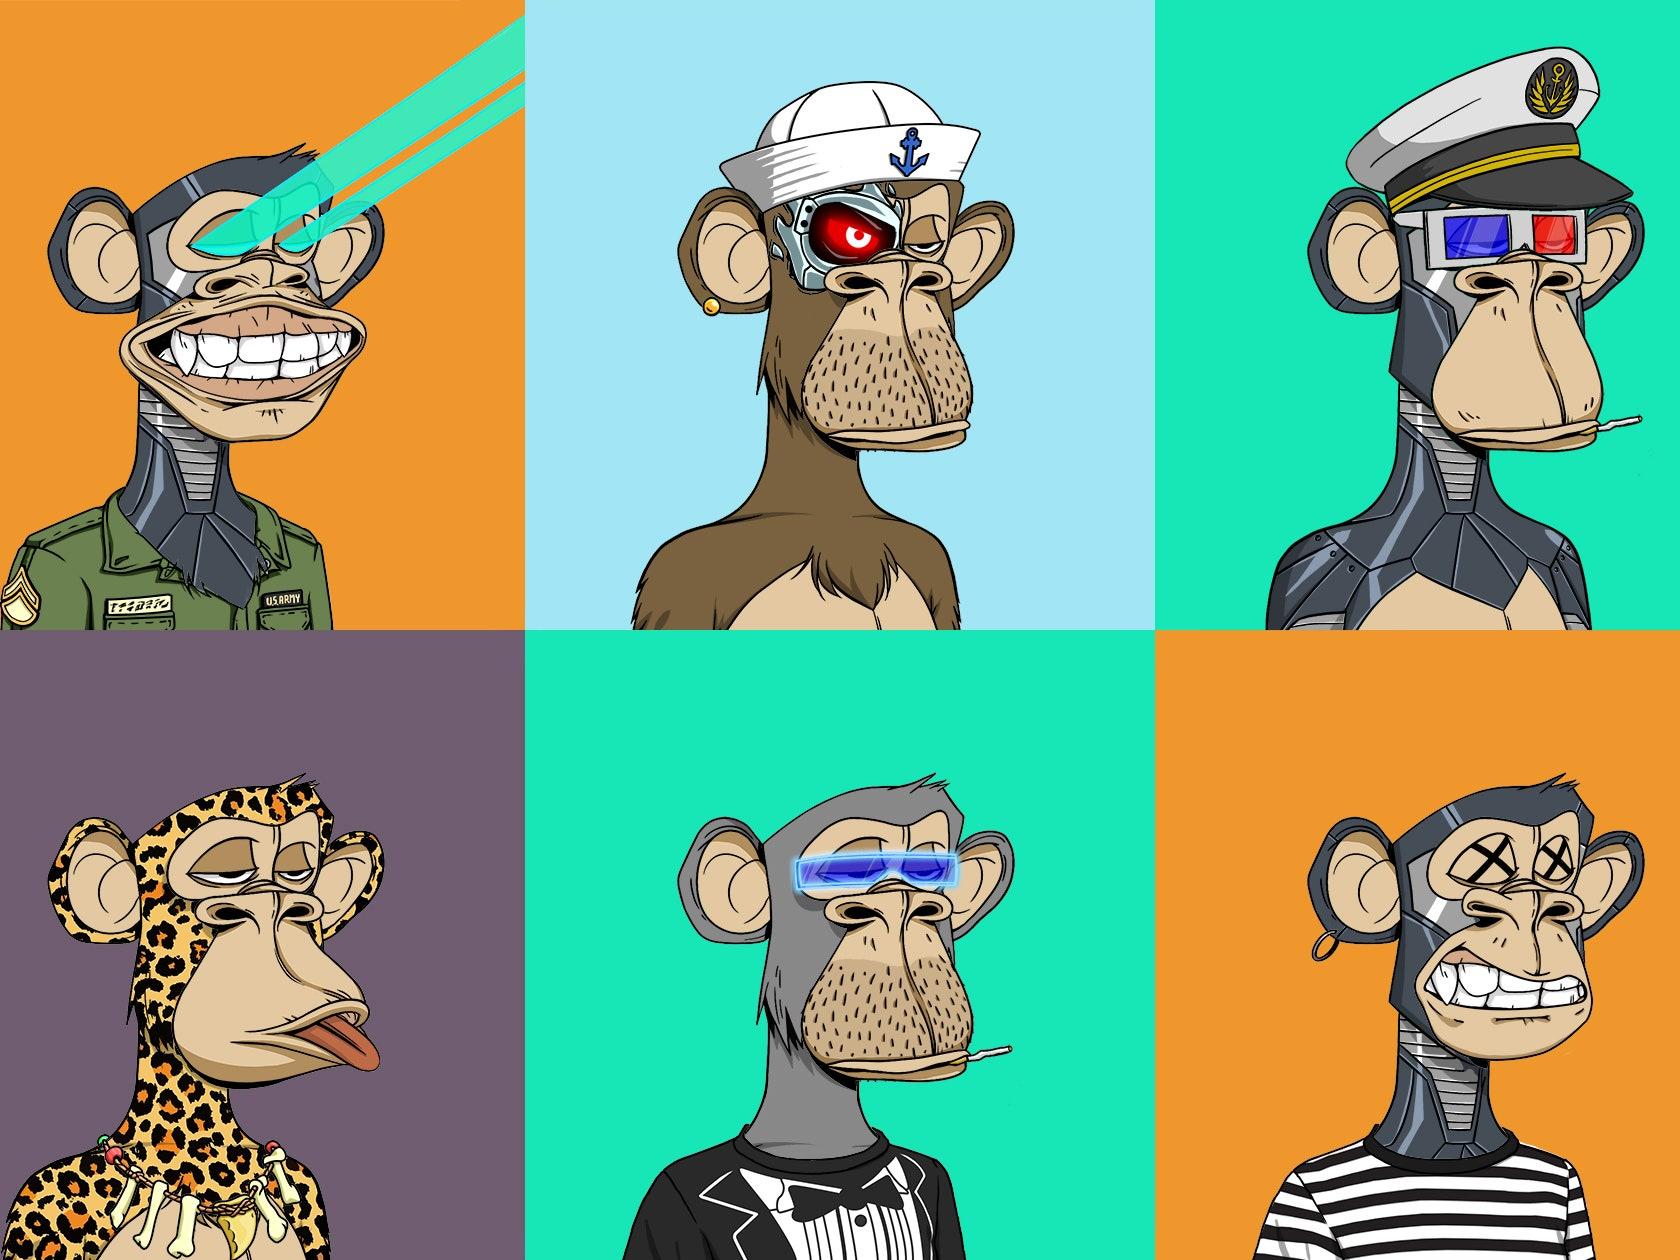 bored-ape-club-nft-crypto-art-altavia.jpeg